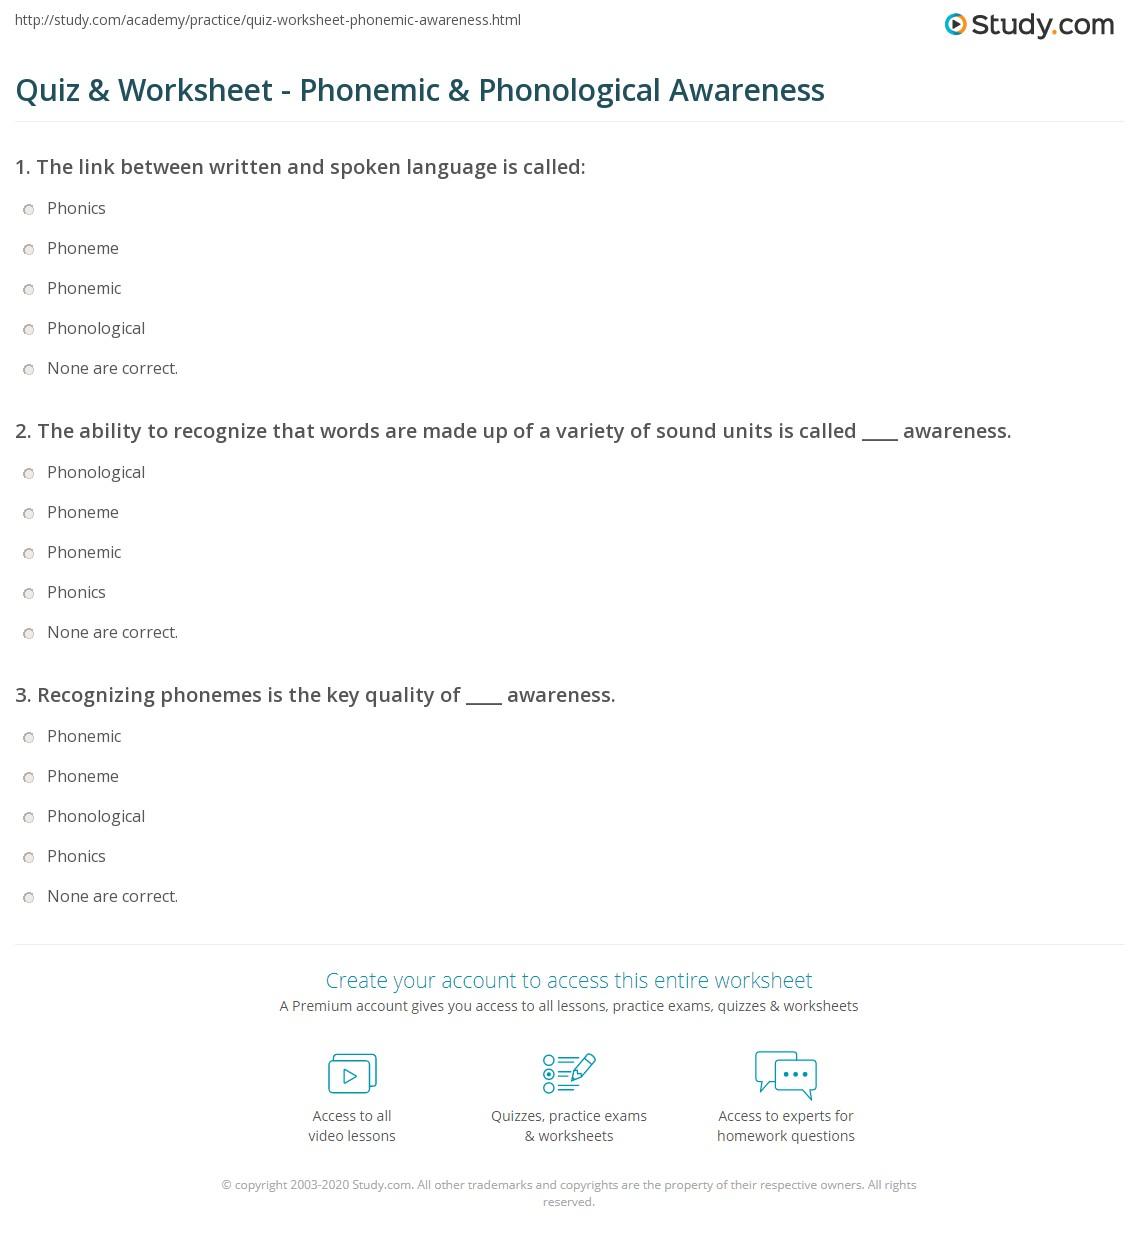 worksheet Phonemic Awareness Worksheets quiz worksheet phonemic phonological awareness study com print definitions activities worksheet